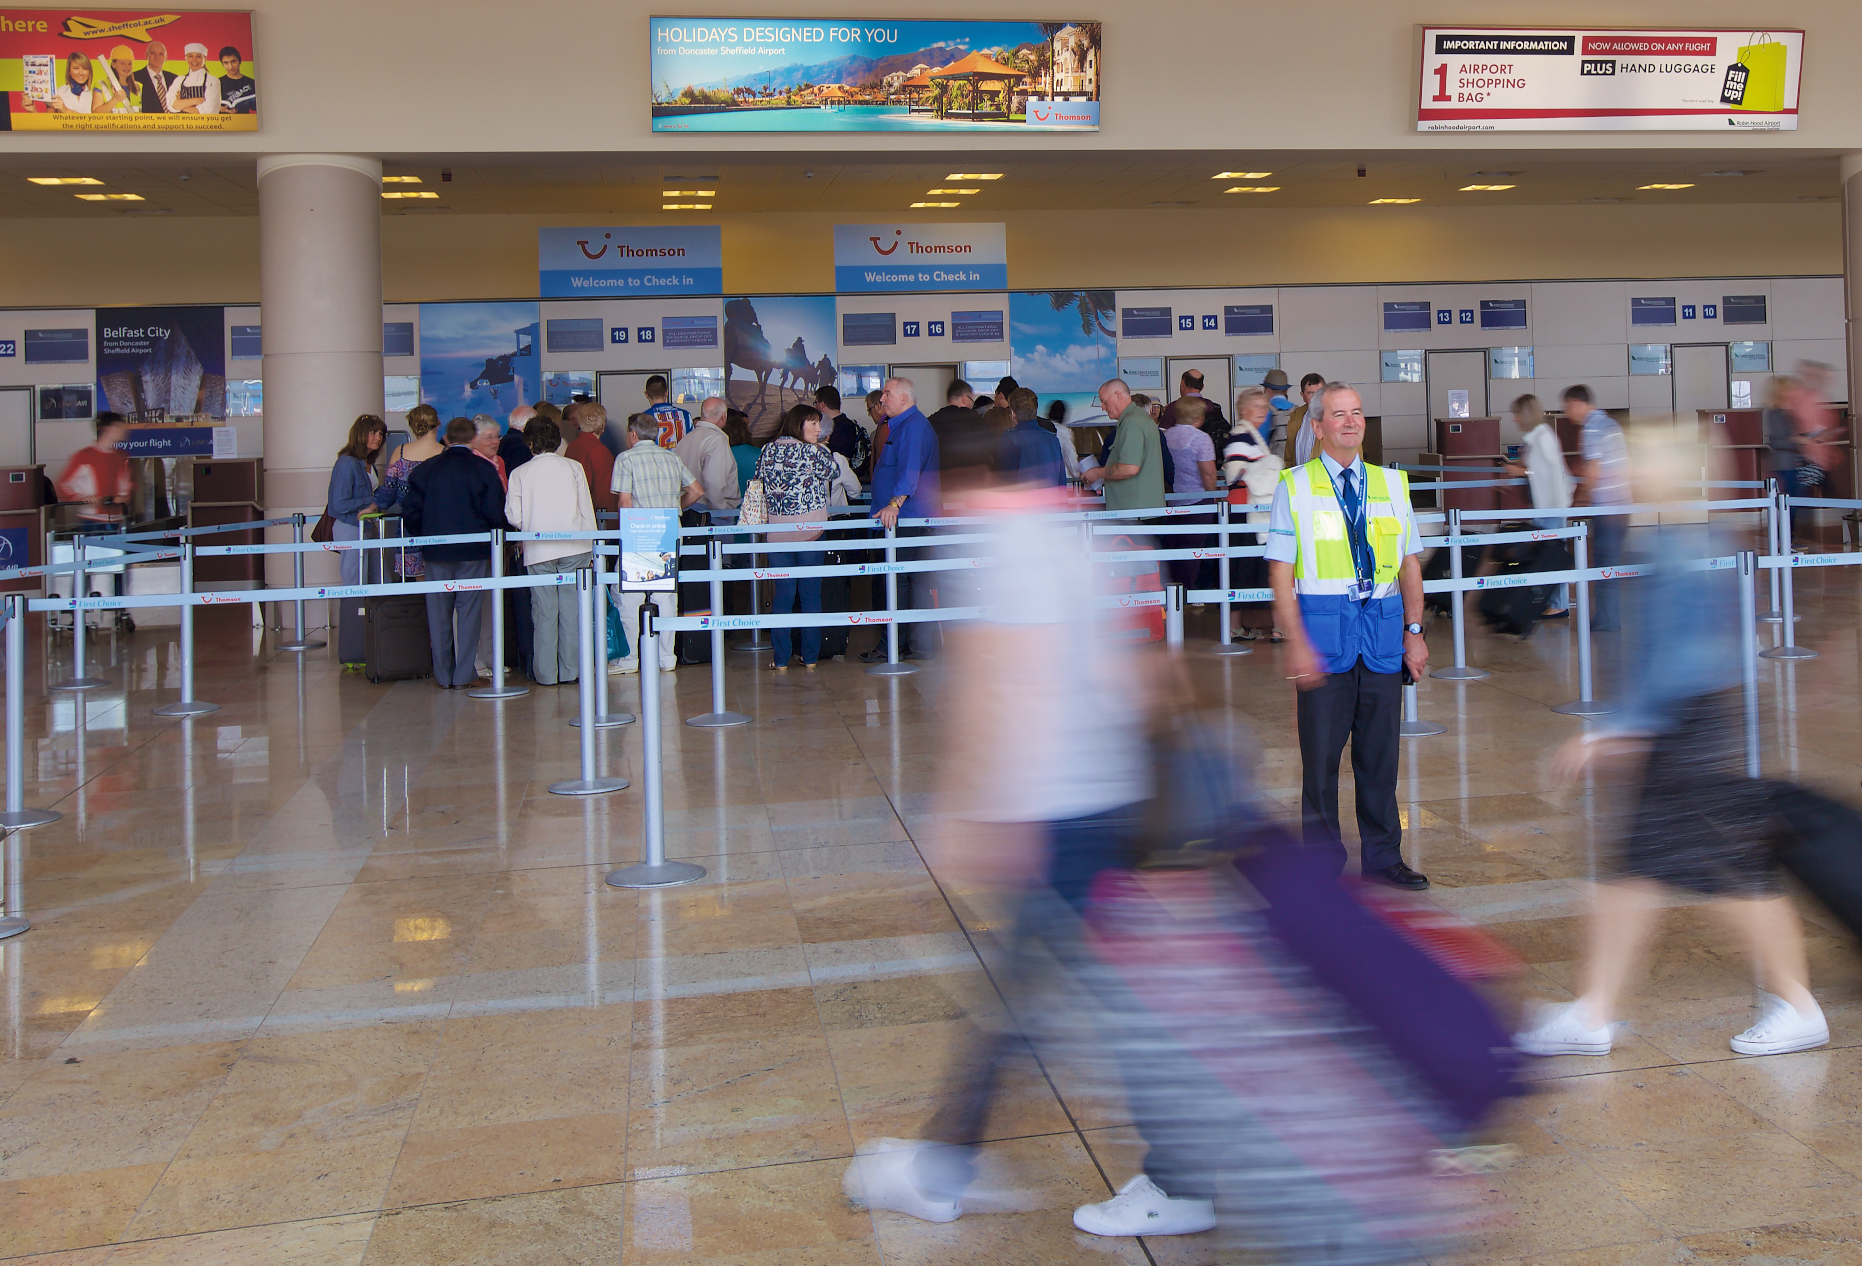 DYP_DSA Terminal 0284.jpg